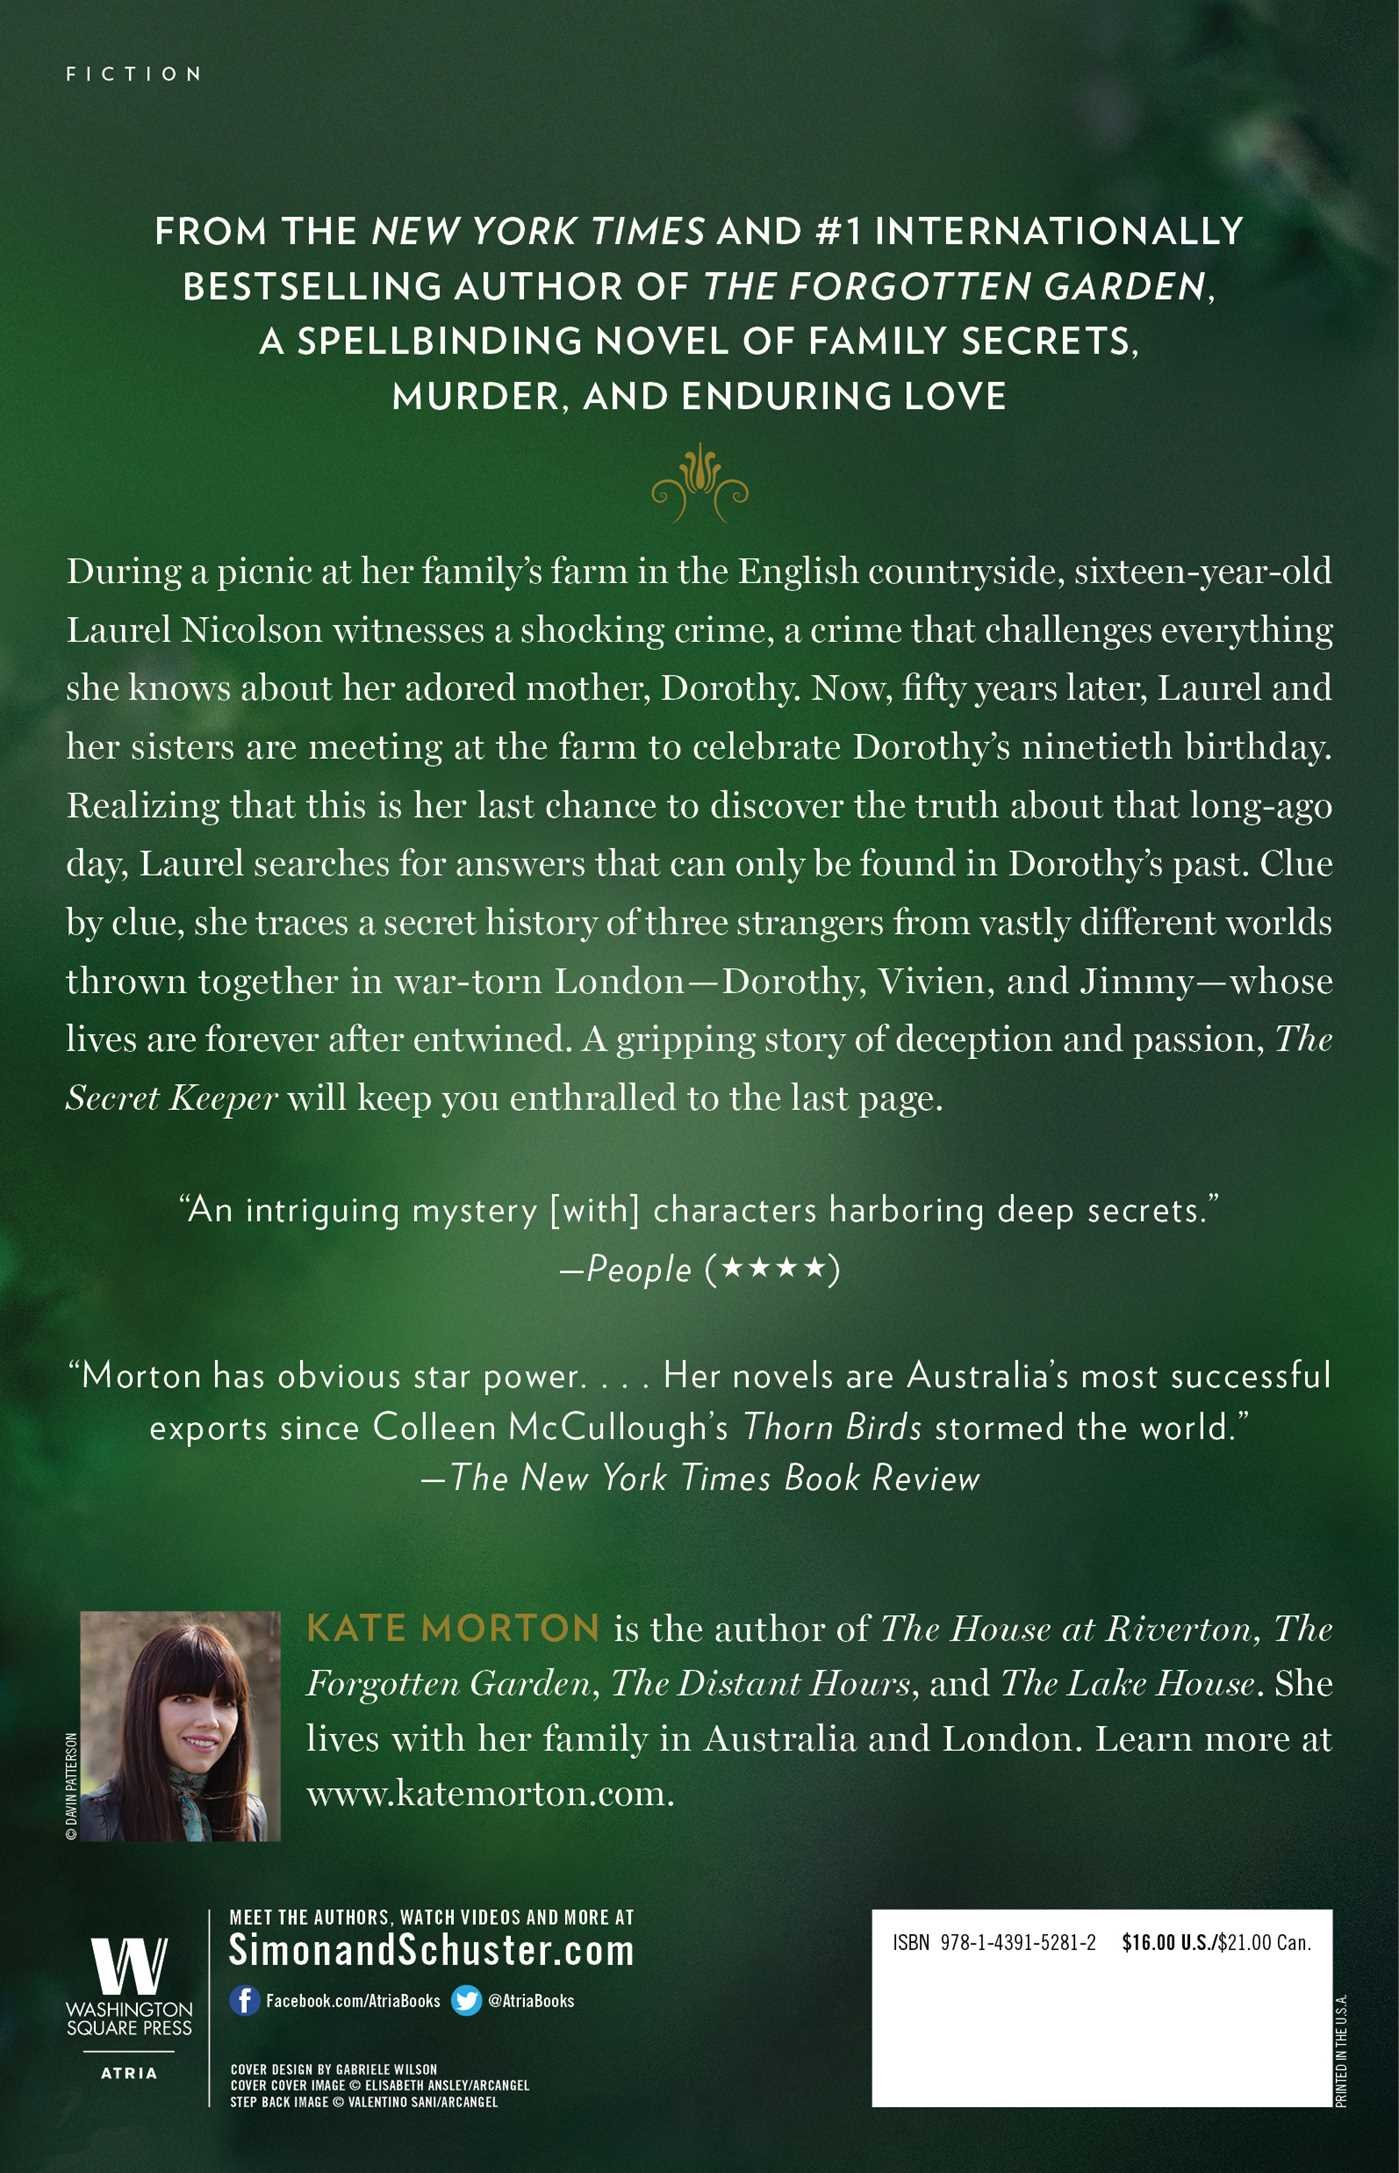 The Secret Keeper: A Novel: Kate Morton: 9781439152812: Amazon: Books